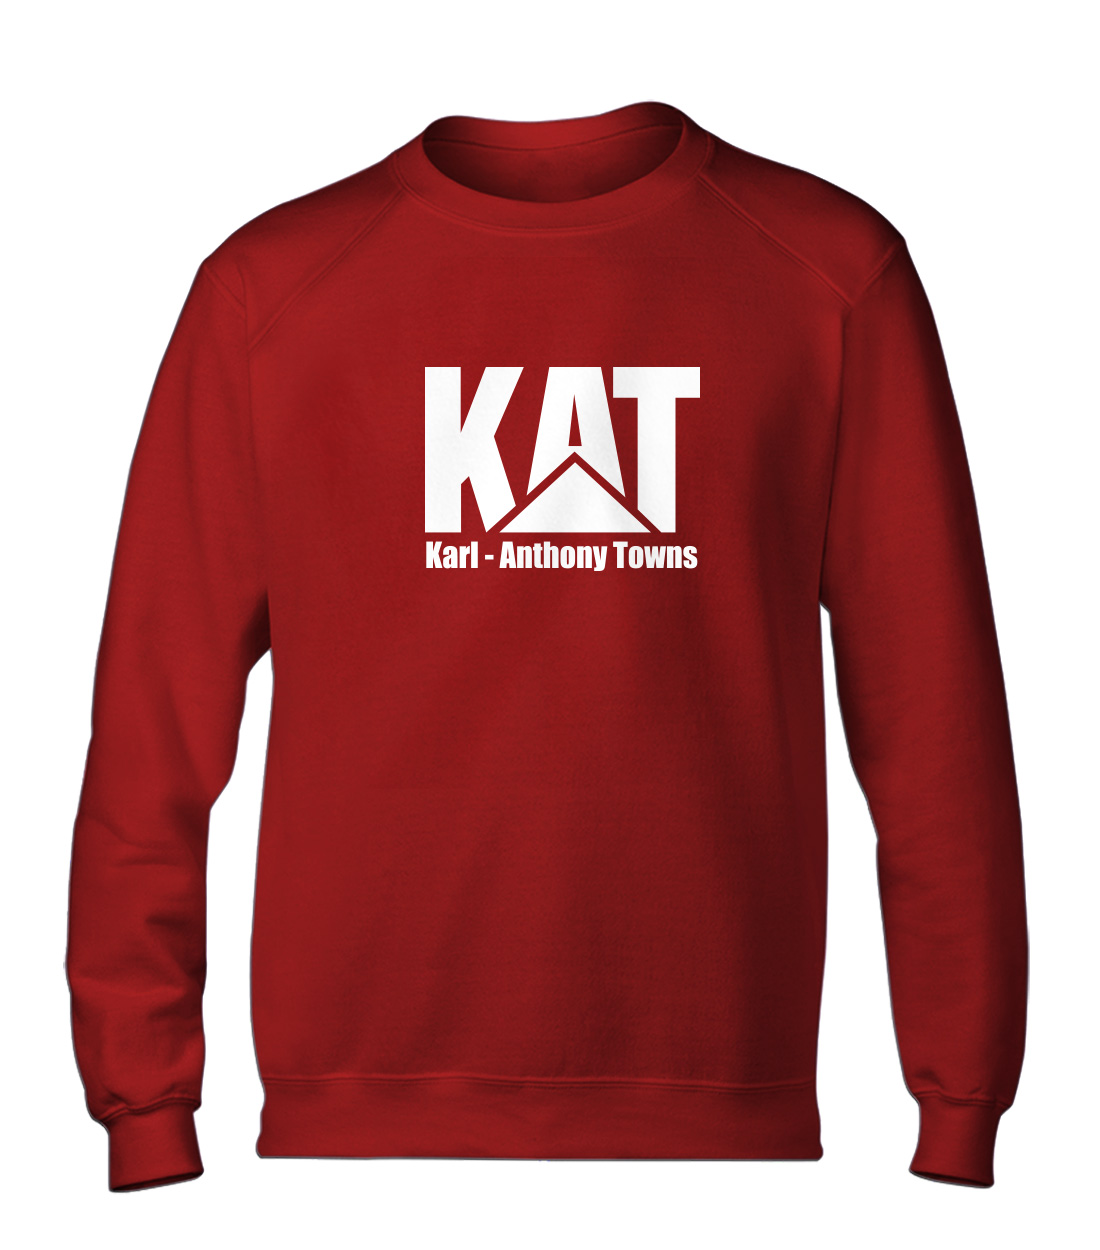 Karl Anthony Towns Basic (BSC-RED-NP-kat-logo-616)